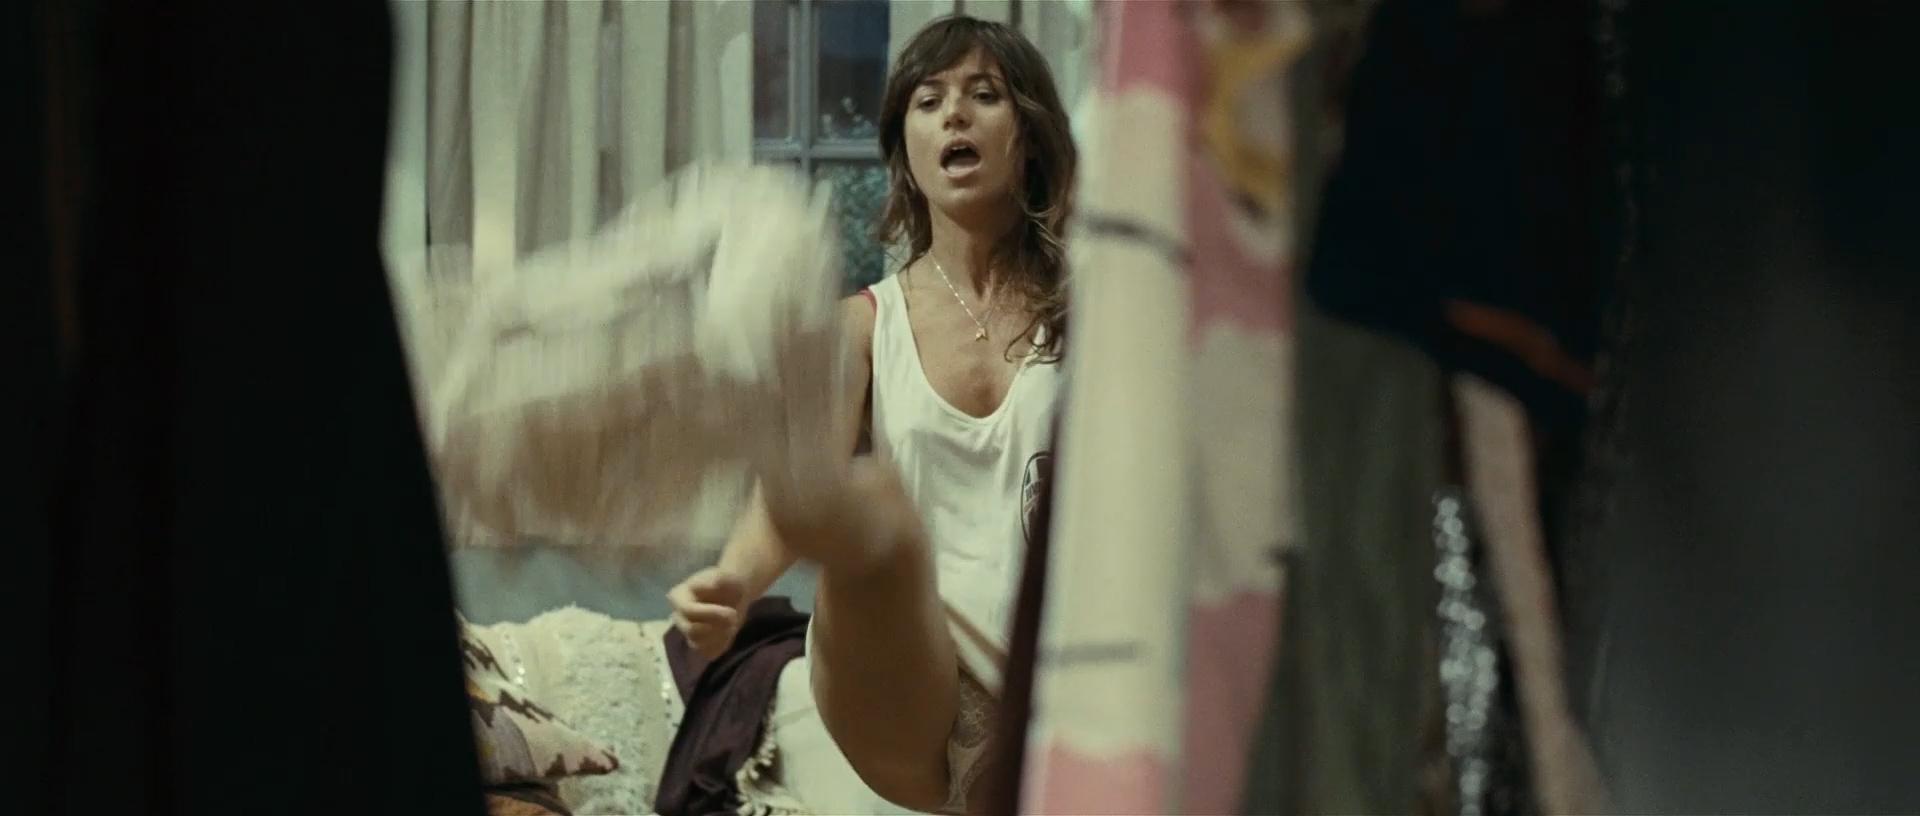 Marta Etura nude brief topless and see through - Mientras duermes aka Sleep Tight (2011) hd1080p (1)